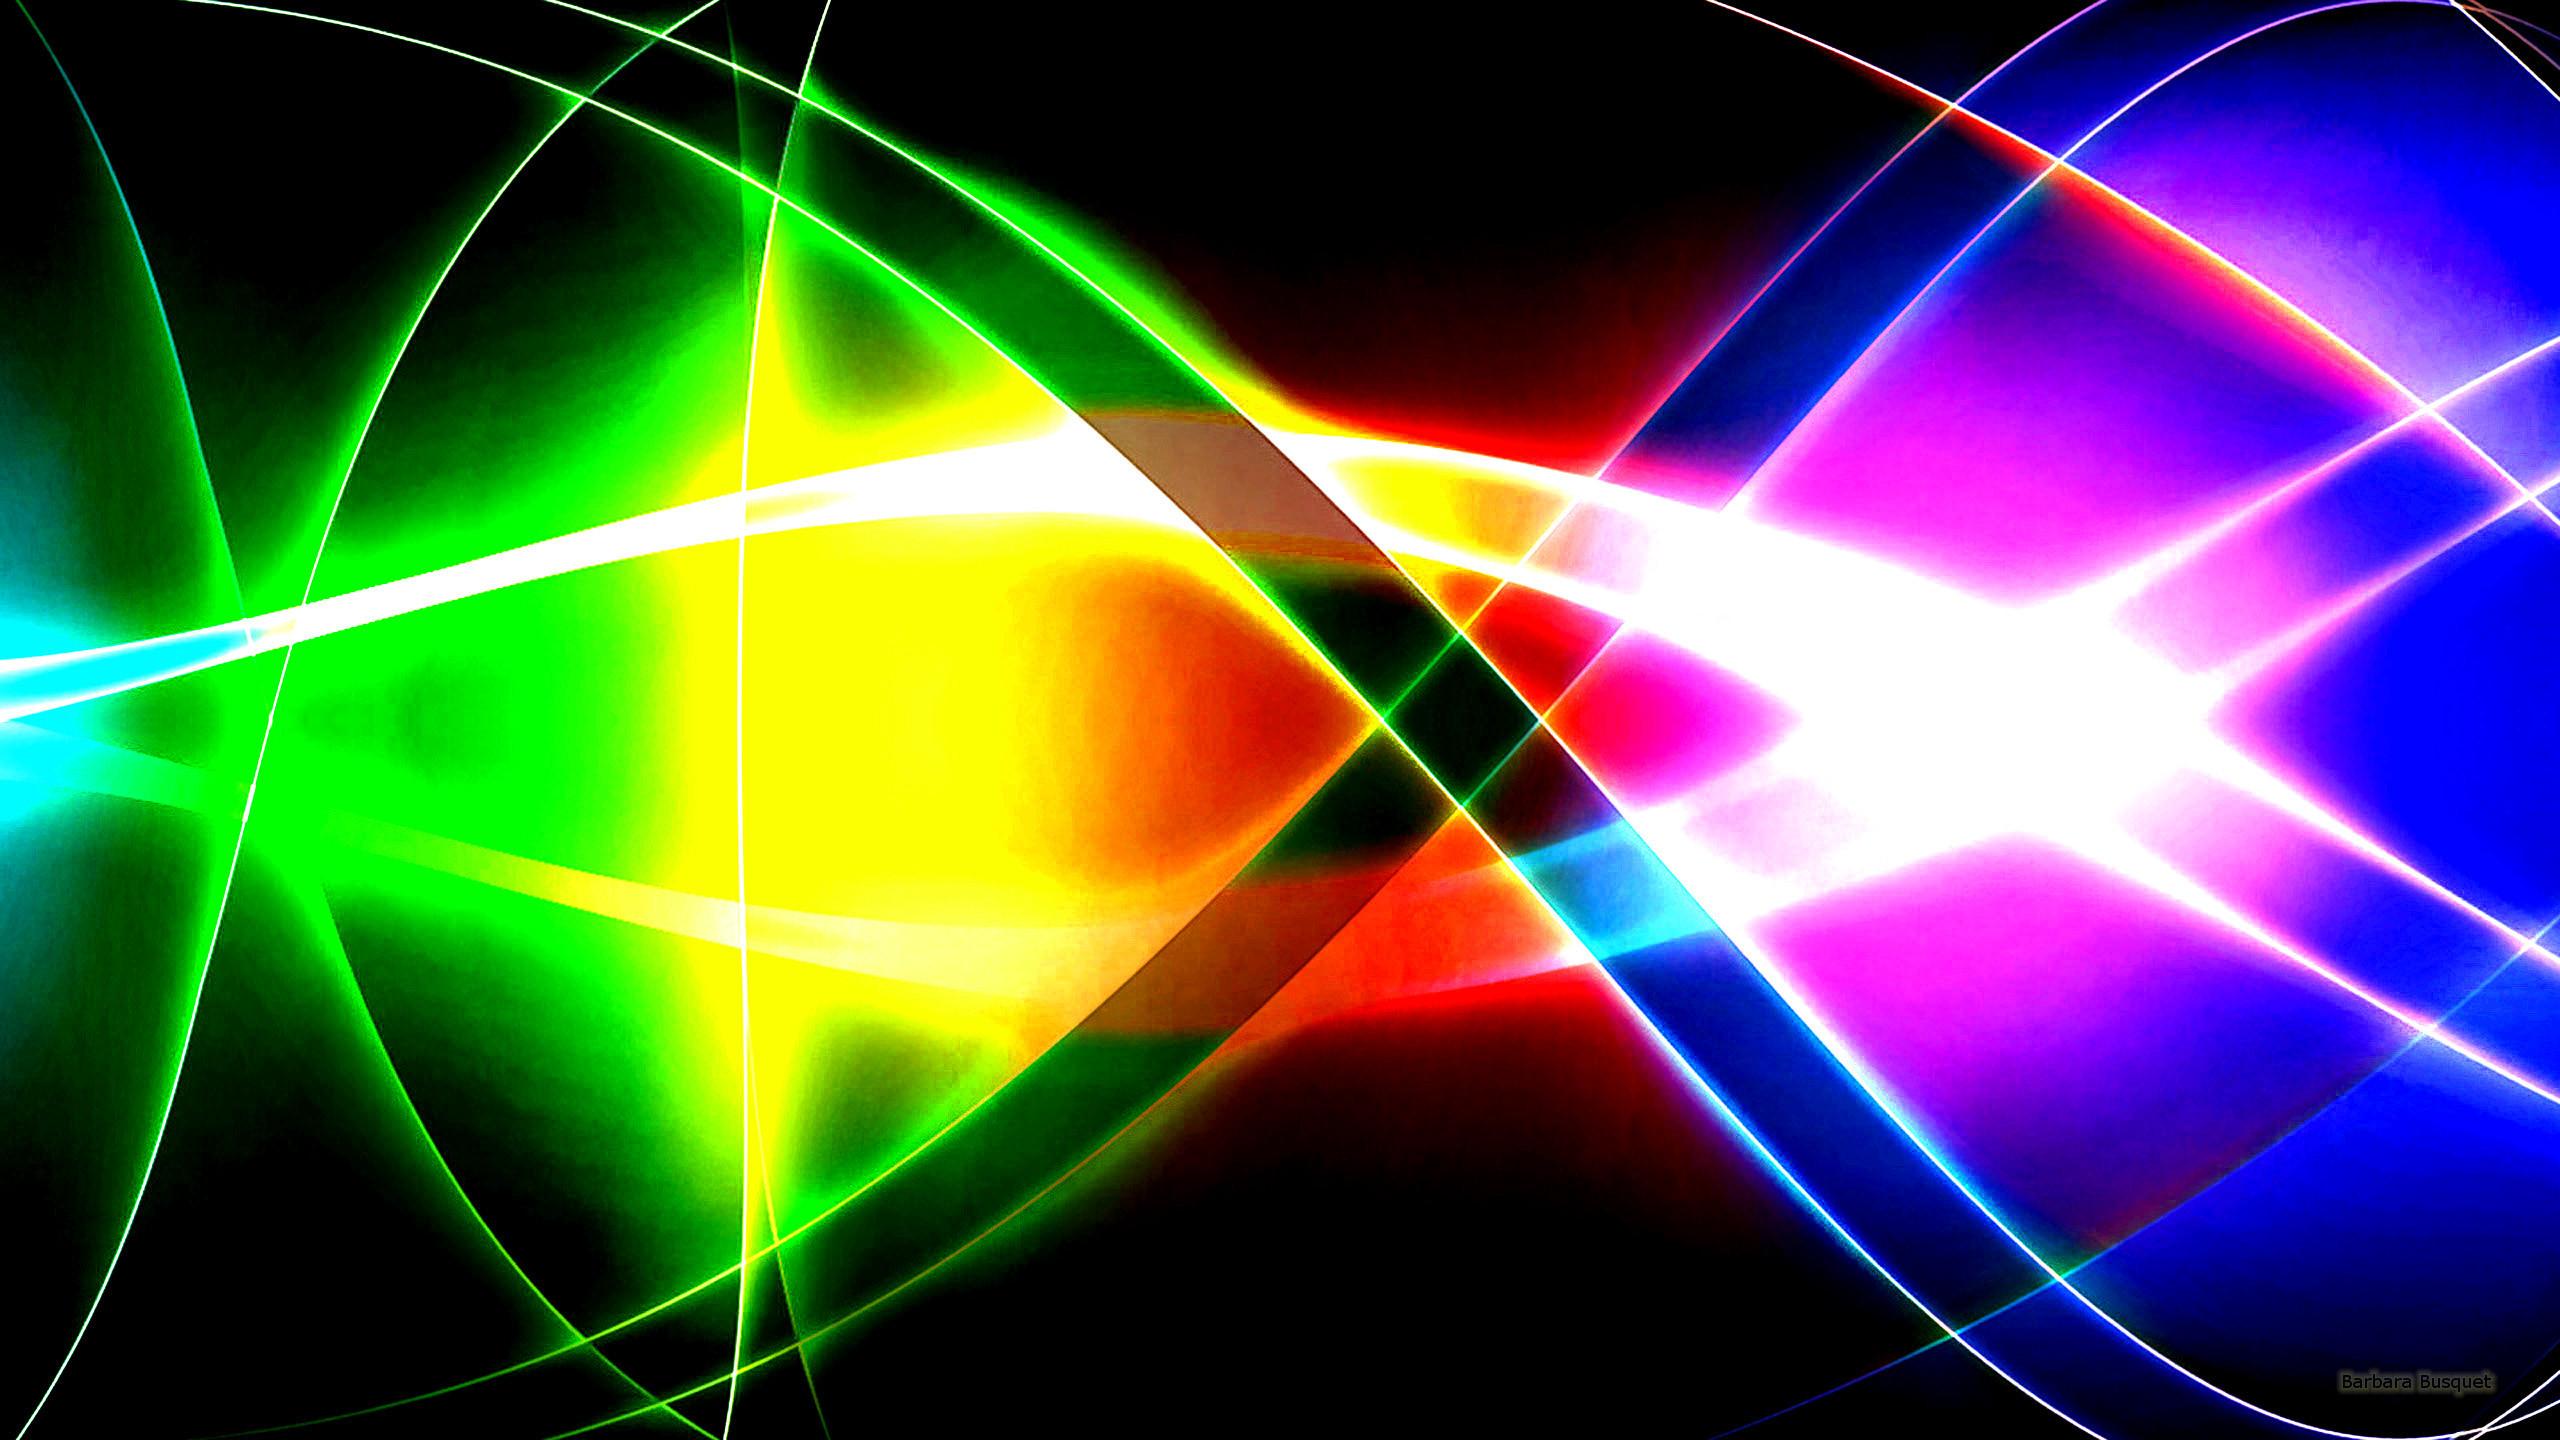 spectrum of light background - photo #18